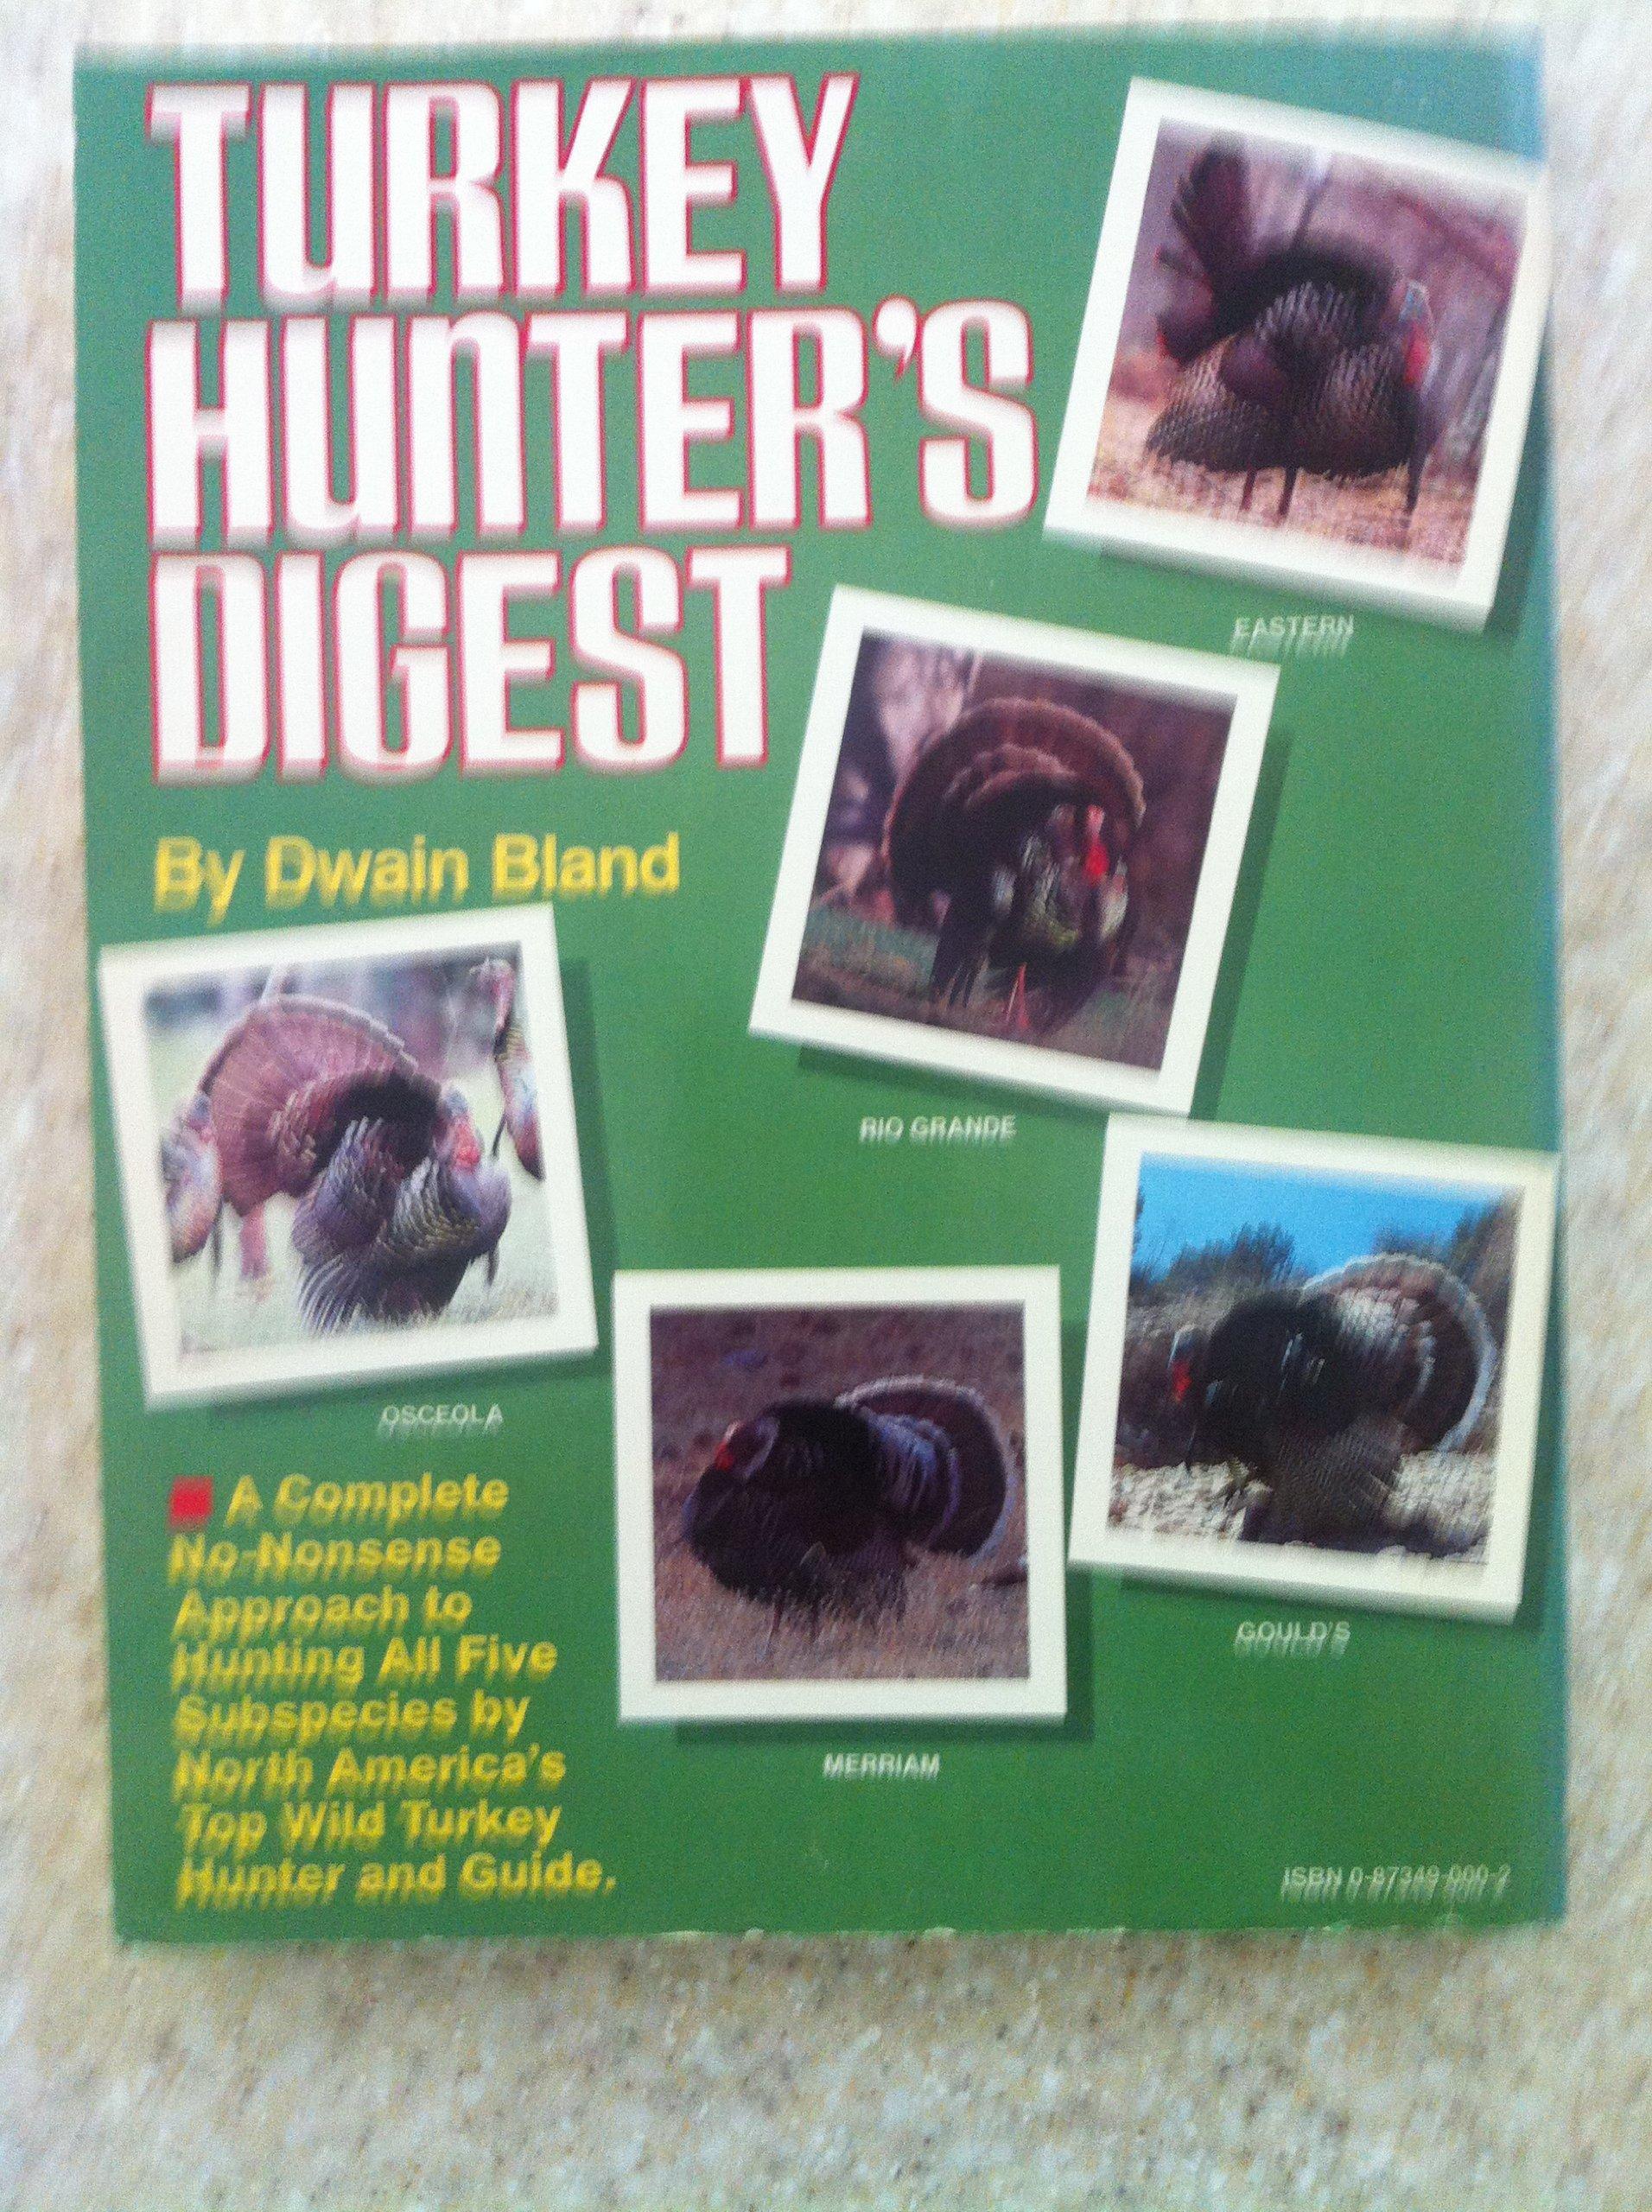 Turkey hunter's digest: Dwain Bland: 9780873490009: Amazon